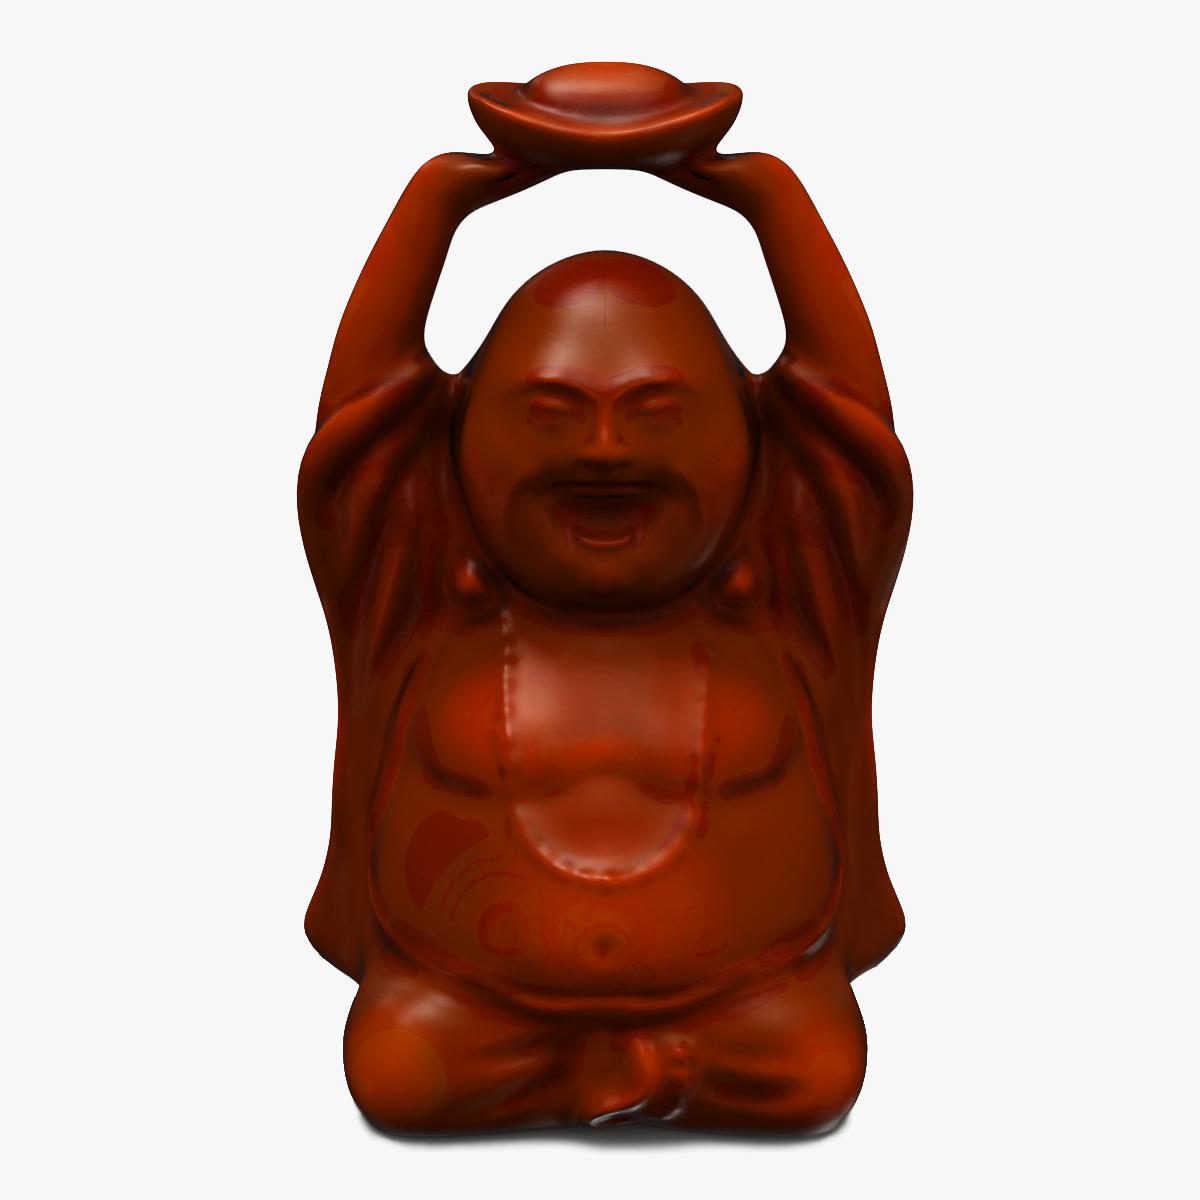 Buddha_Statuette_v2_000.jpg